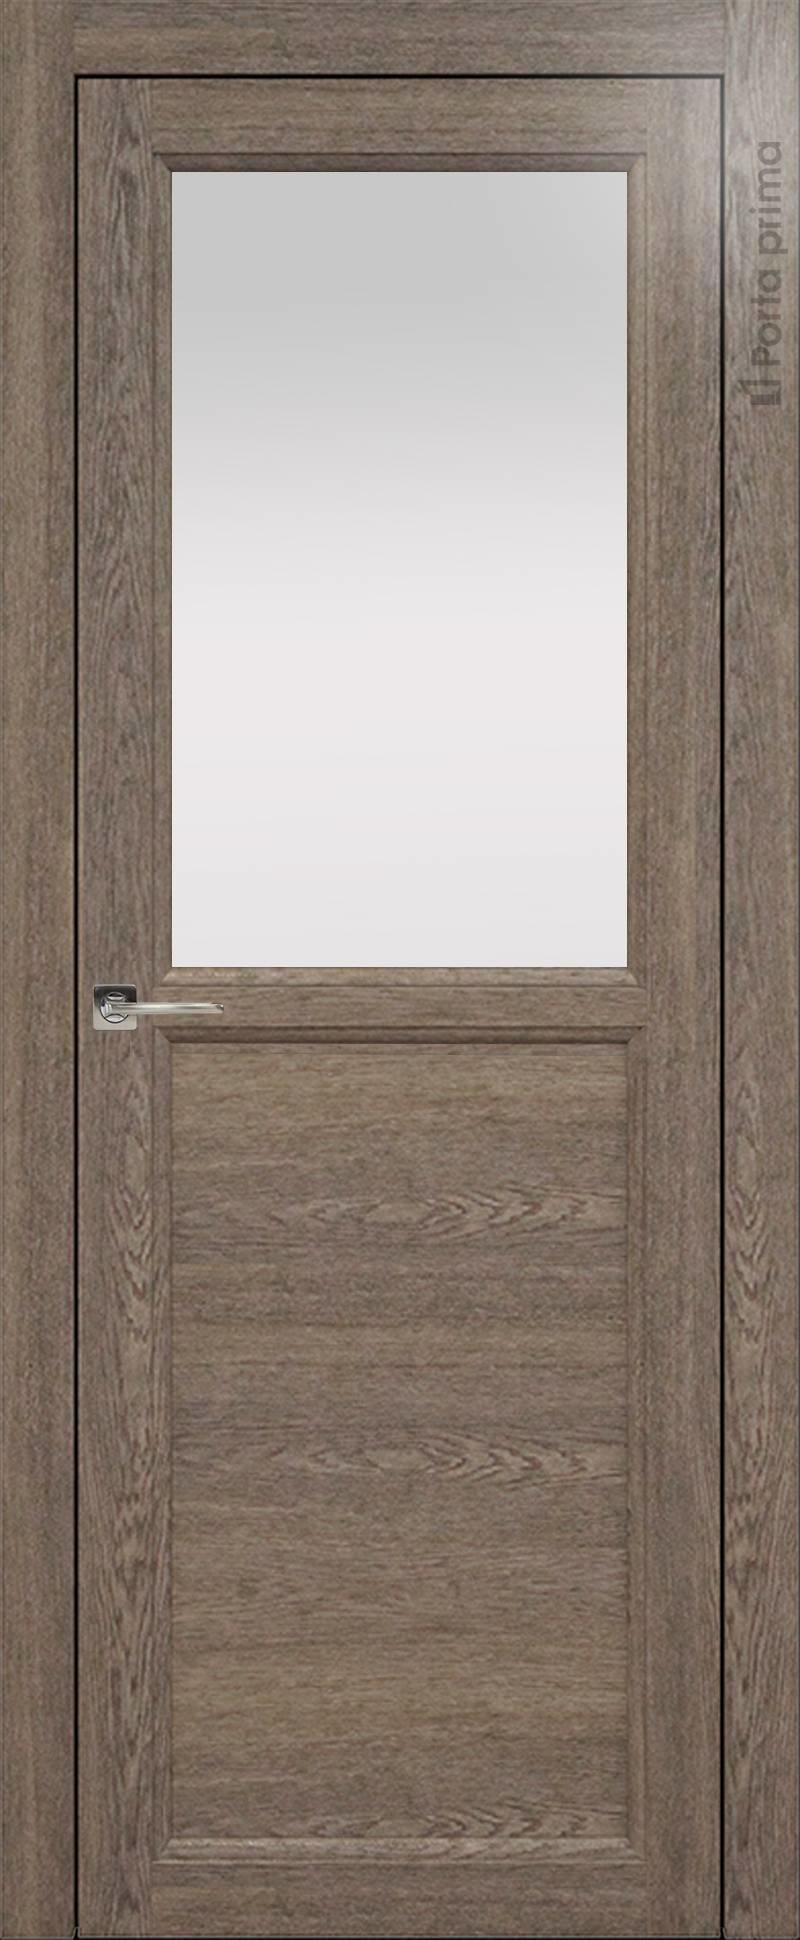 Sorrento-R Б1 цвет - Дуб антик Со стеклом (ДО)